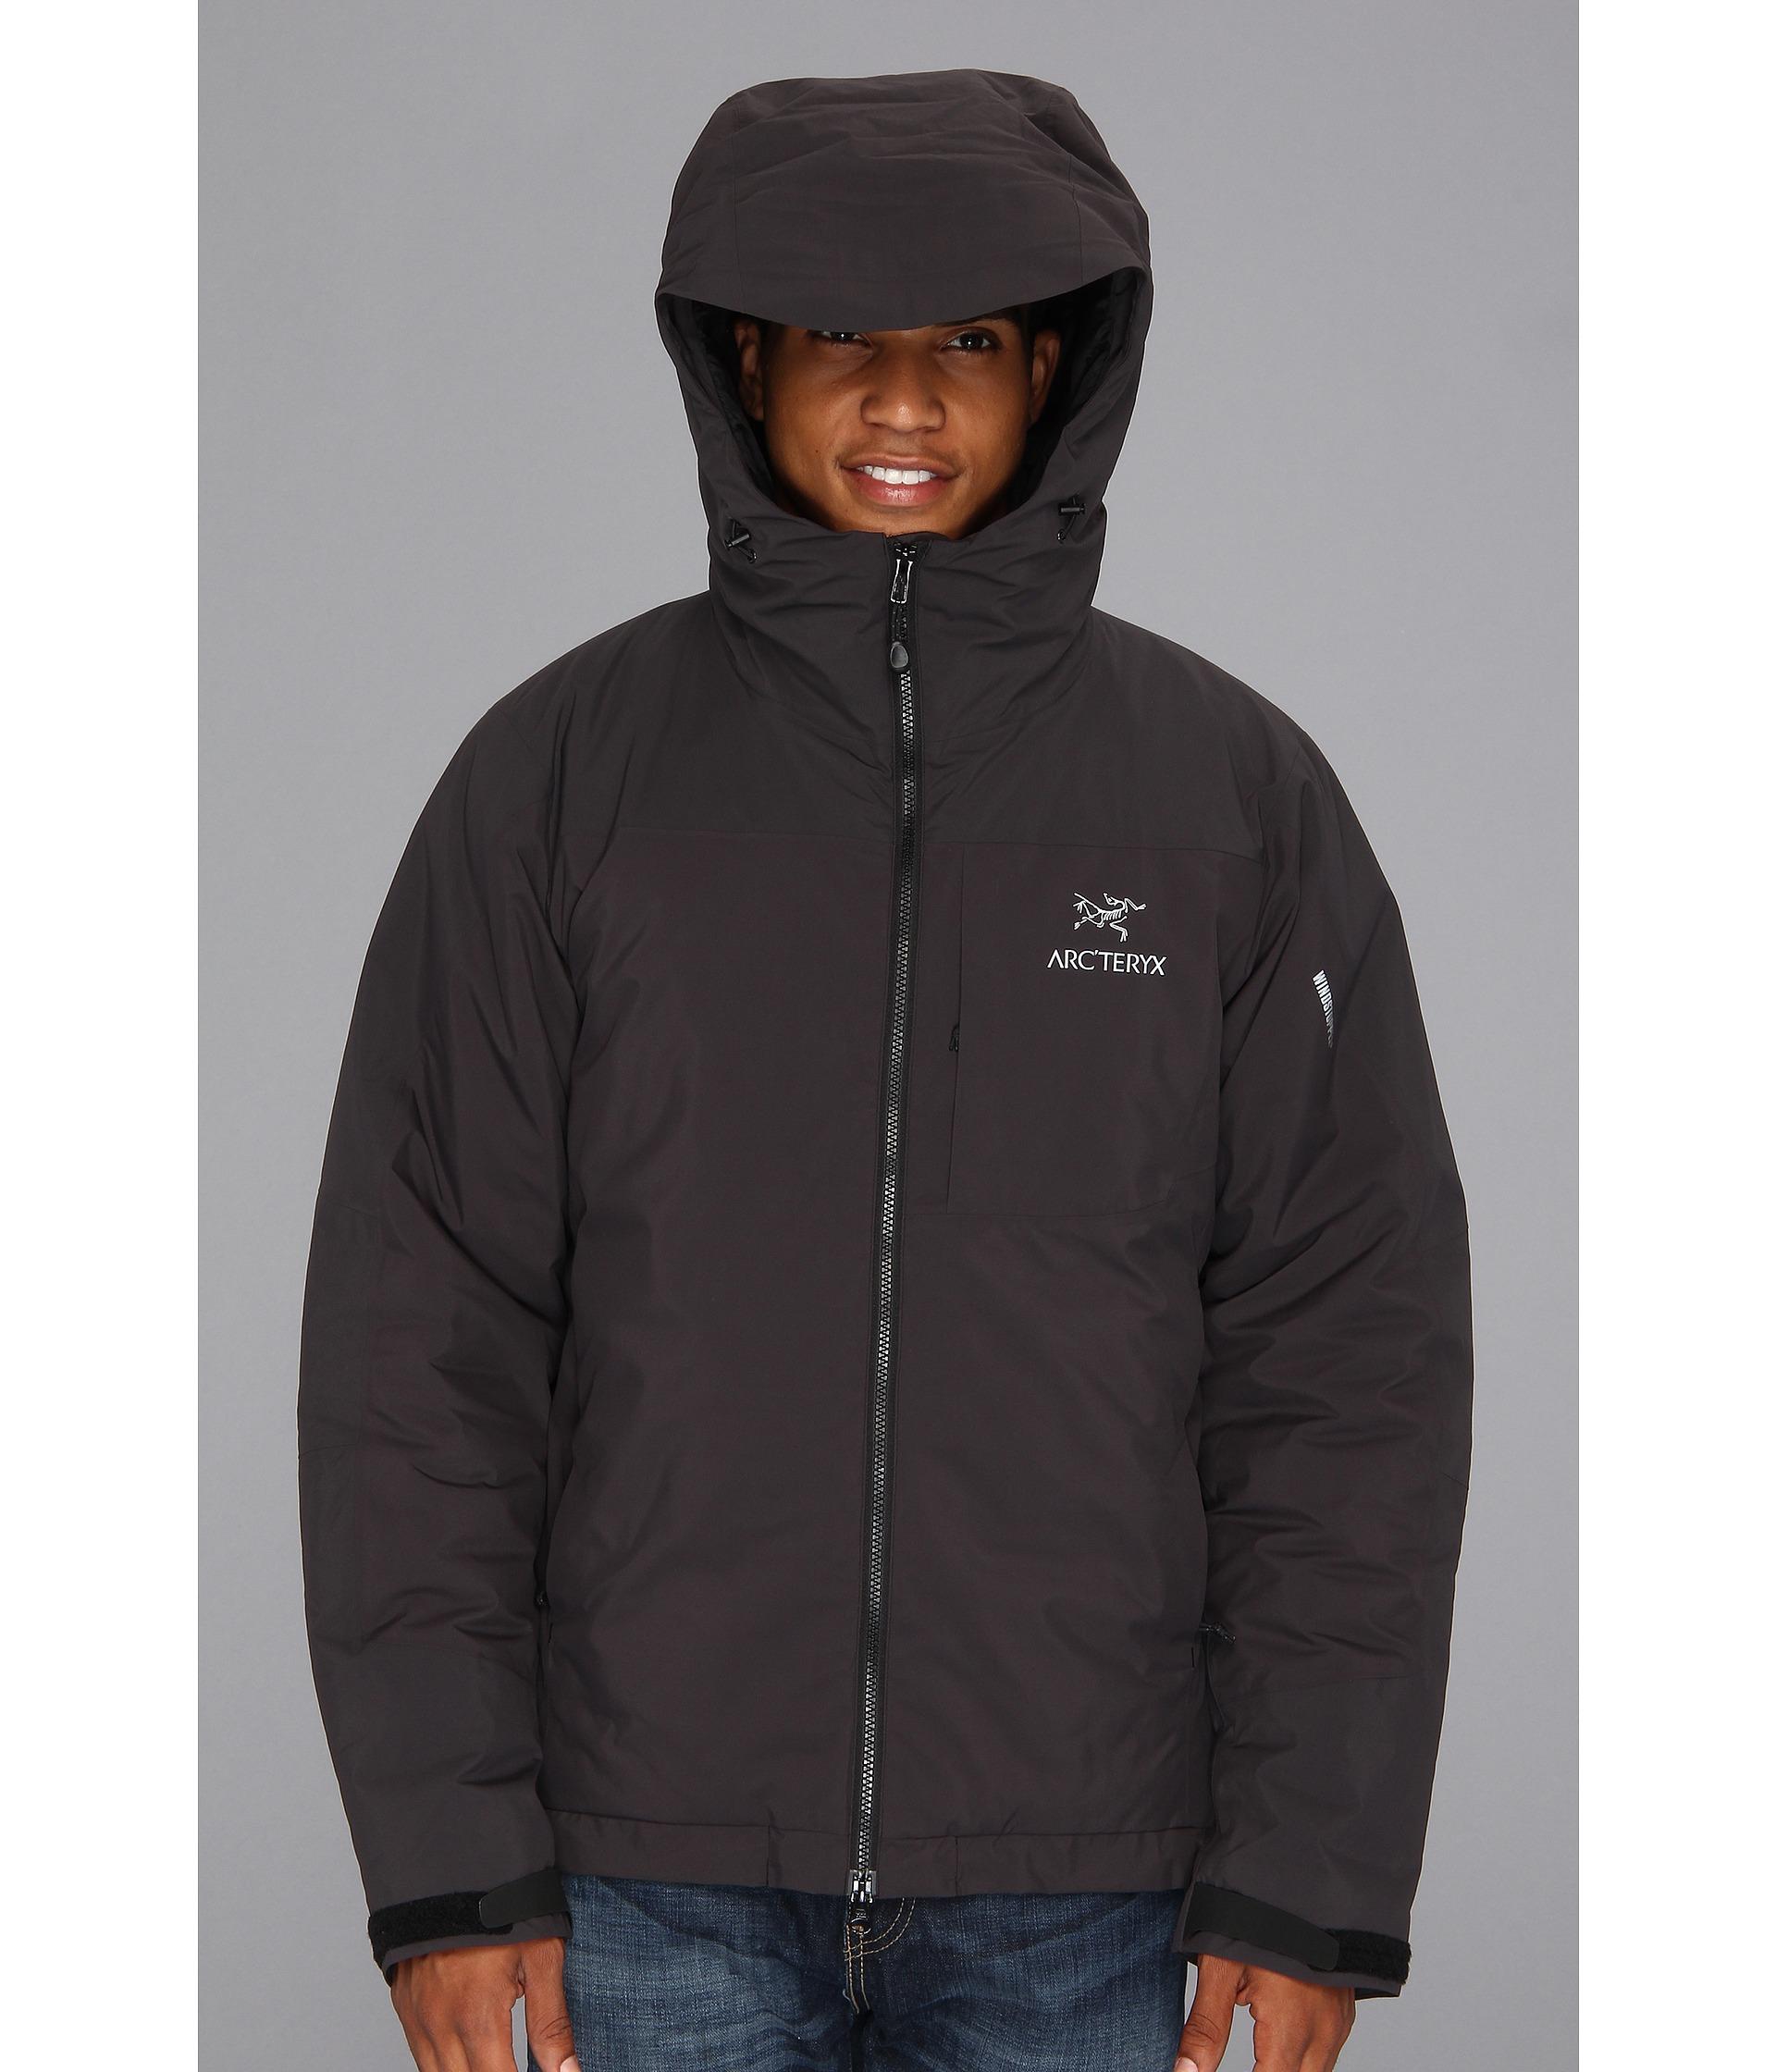 arc teryx kappa hoodie